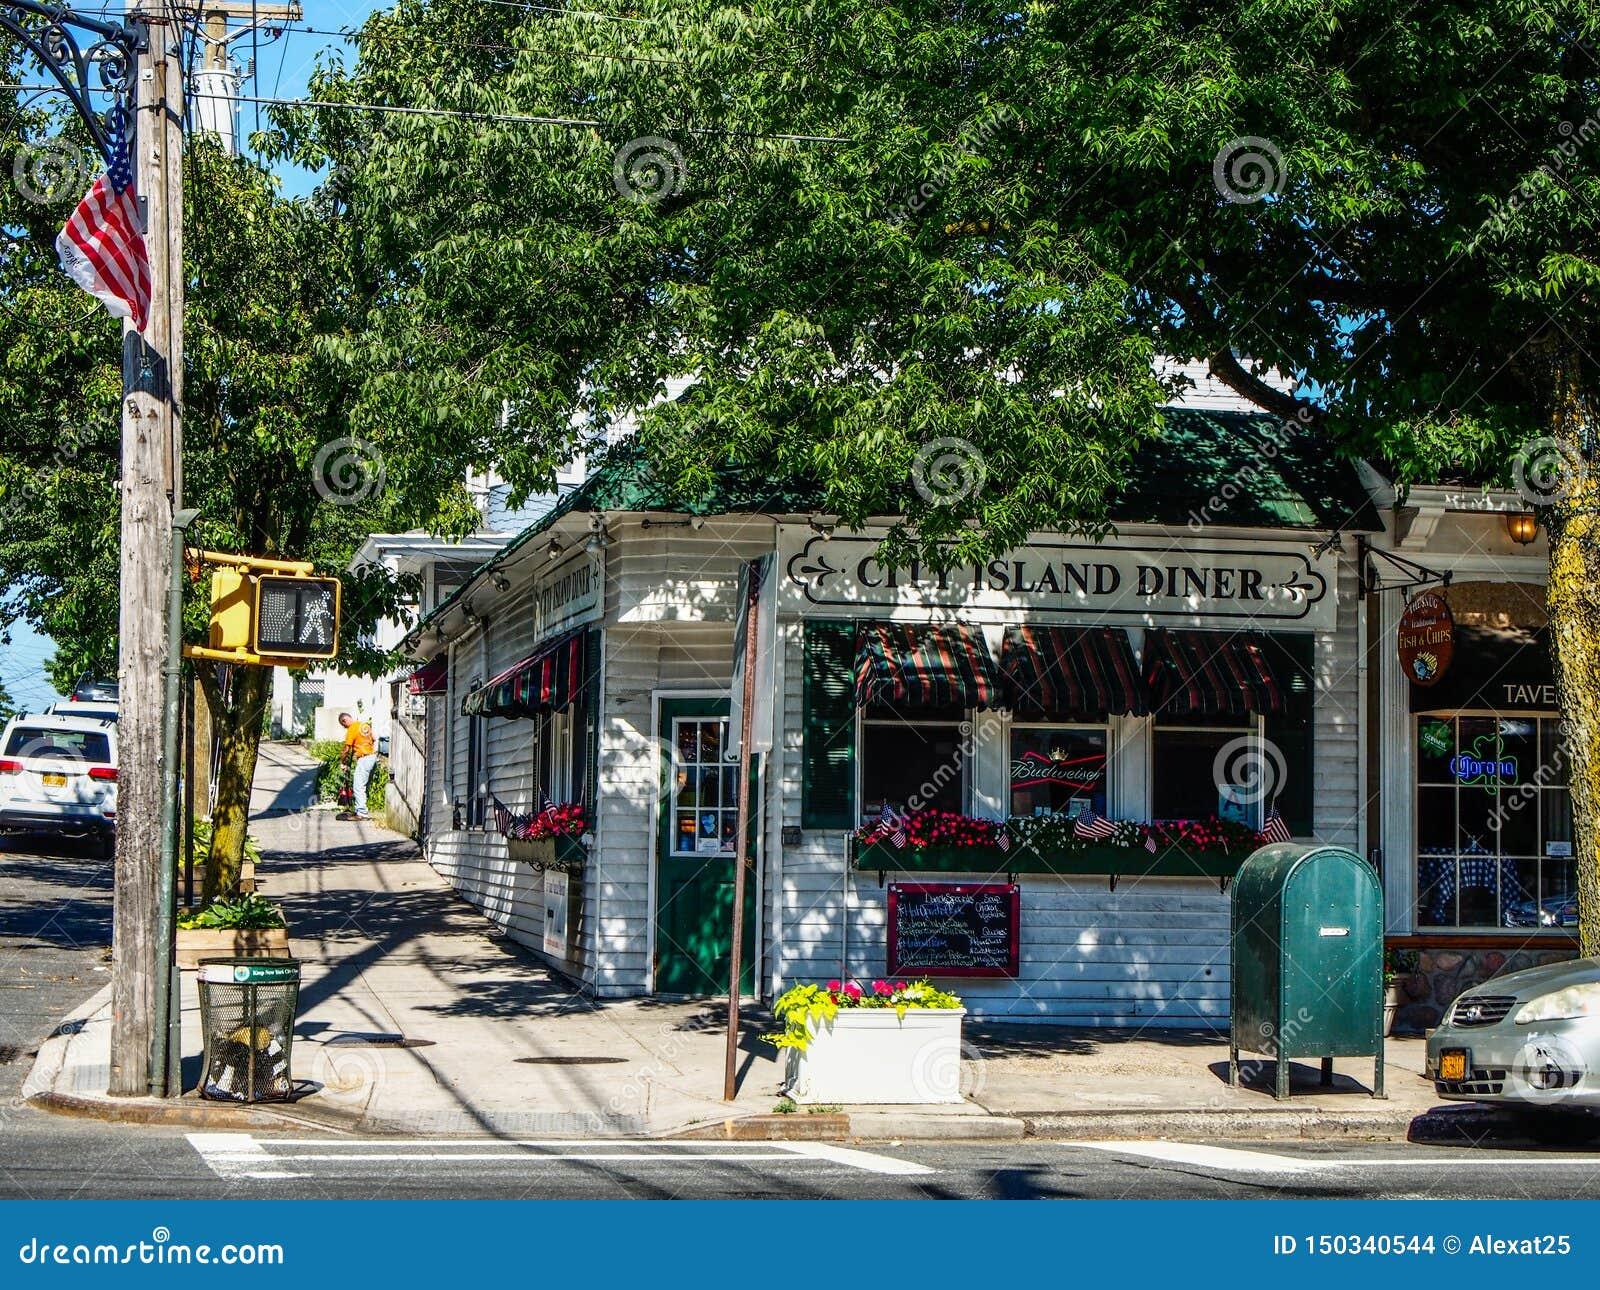 New York - United States - Street of City Island in New York - United States